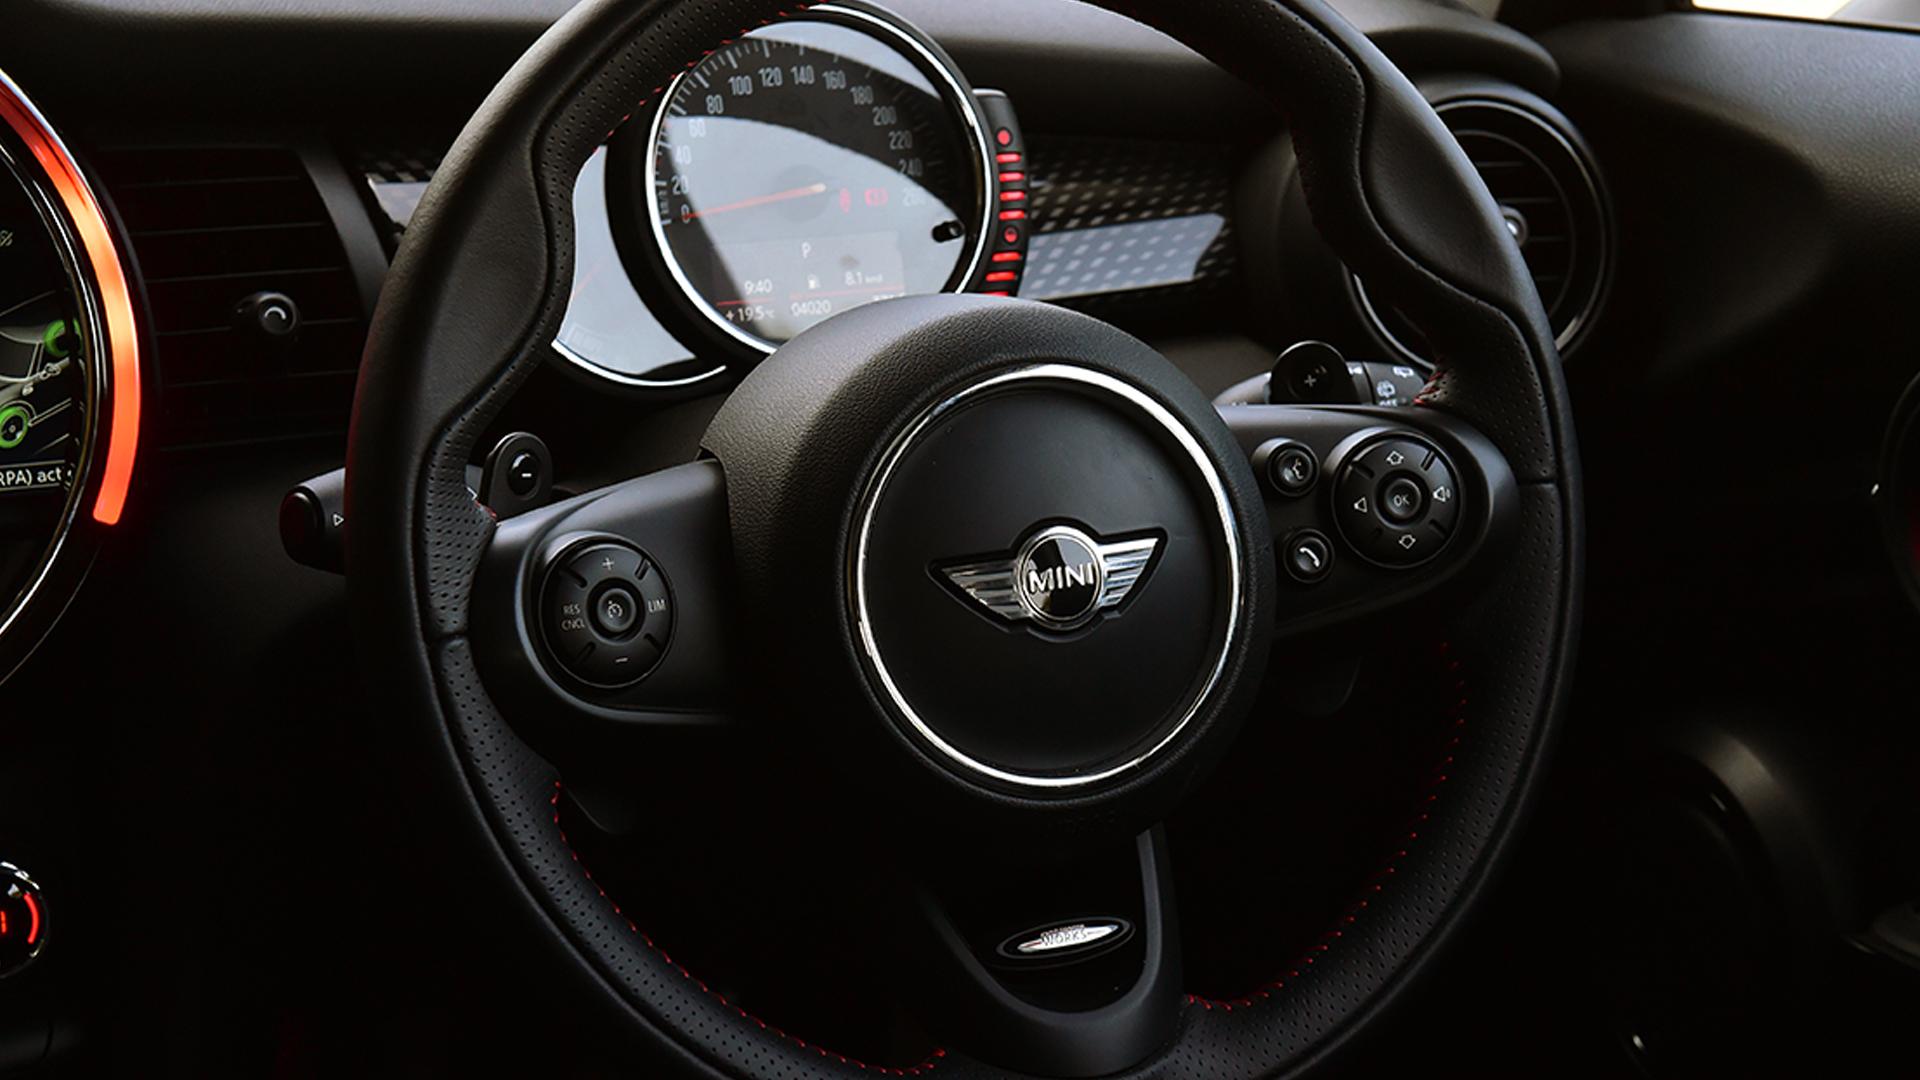 Mini Cooper S 3 Door Interior Car Photos Overdrive